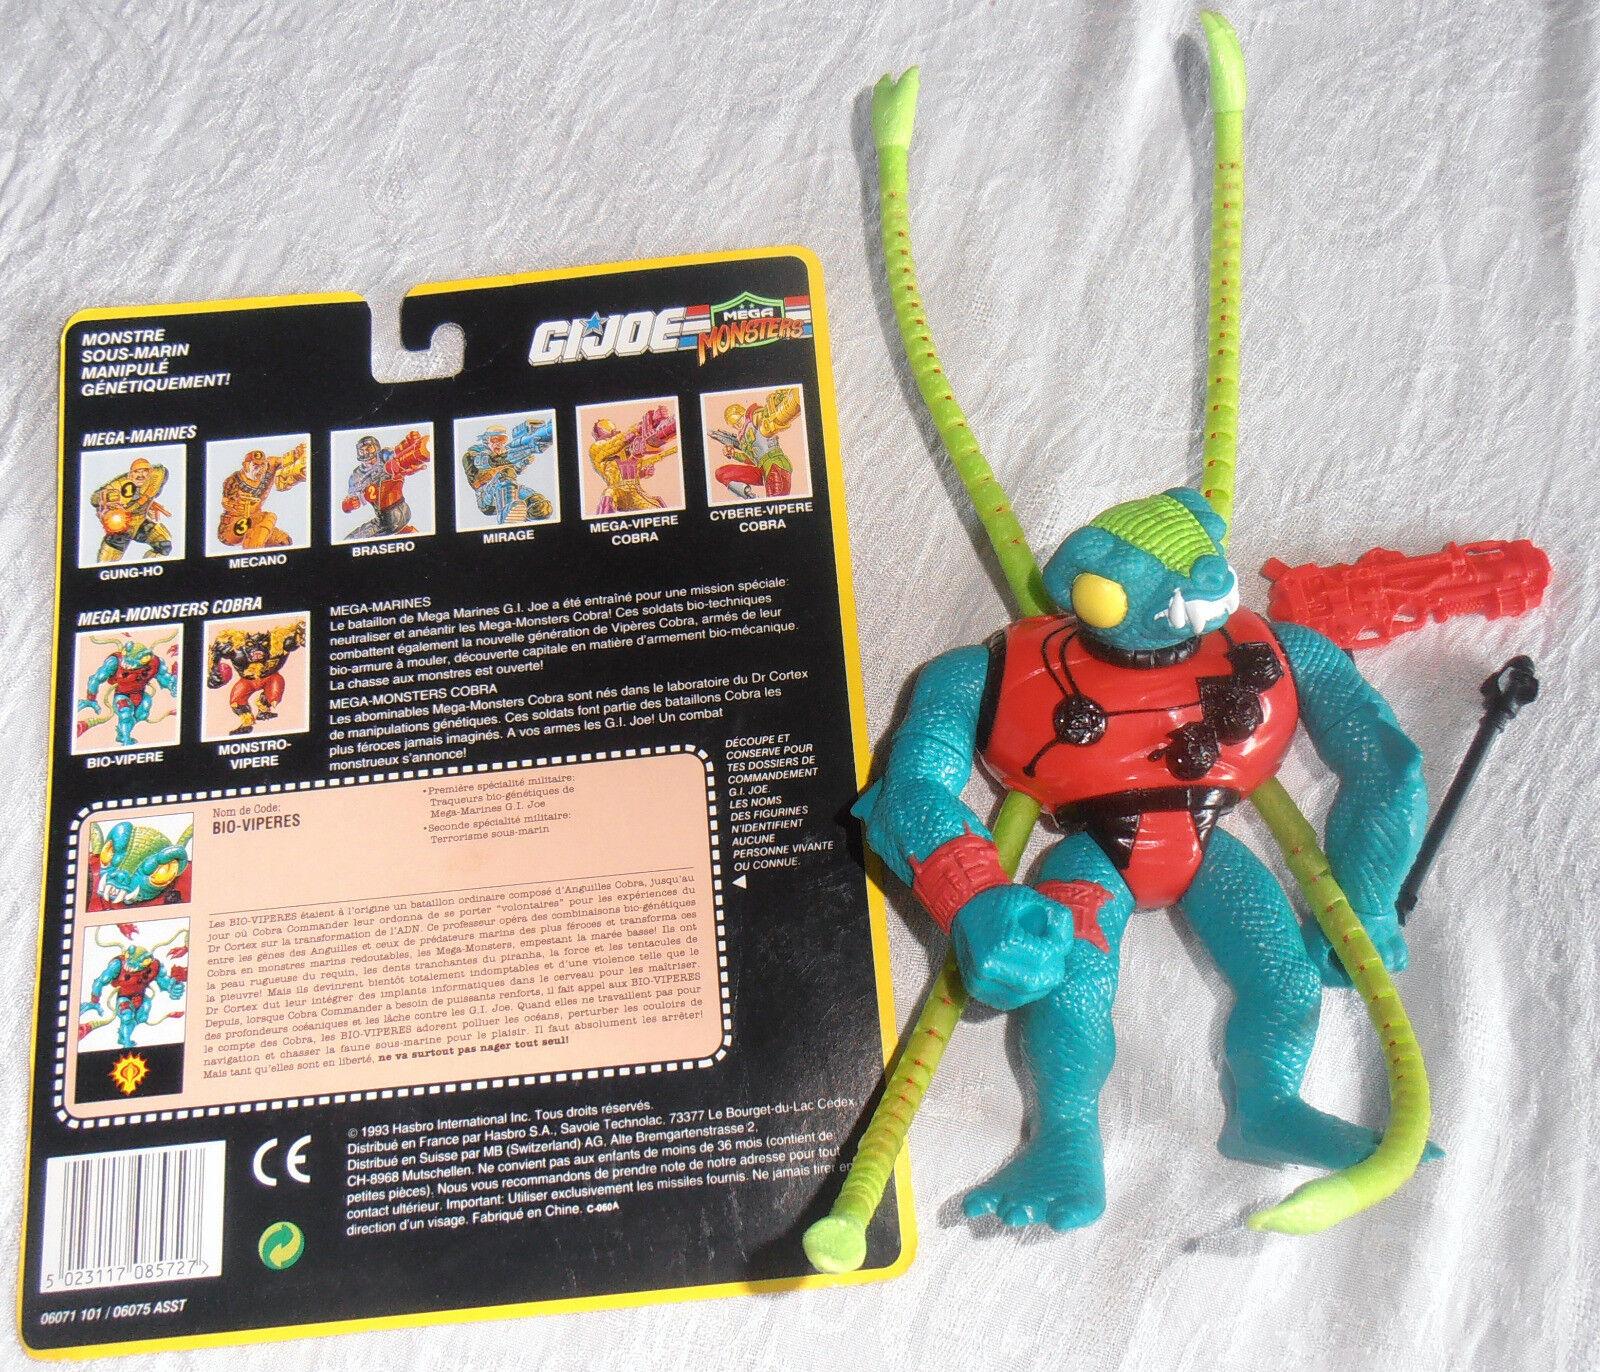 GI JOE Cobra HASBRO 1993 Bio-vipères (Bio-Viper) 100 % complet + carte blister